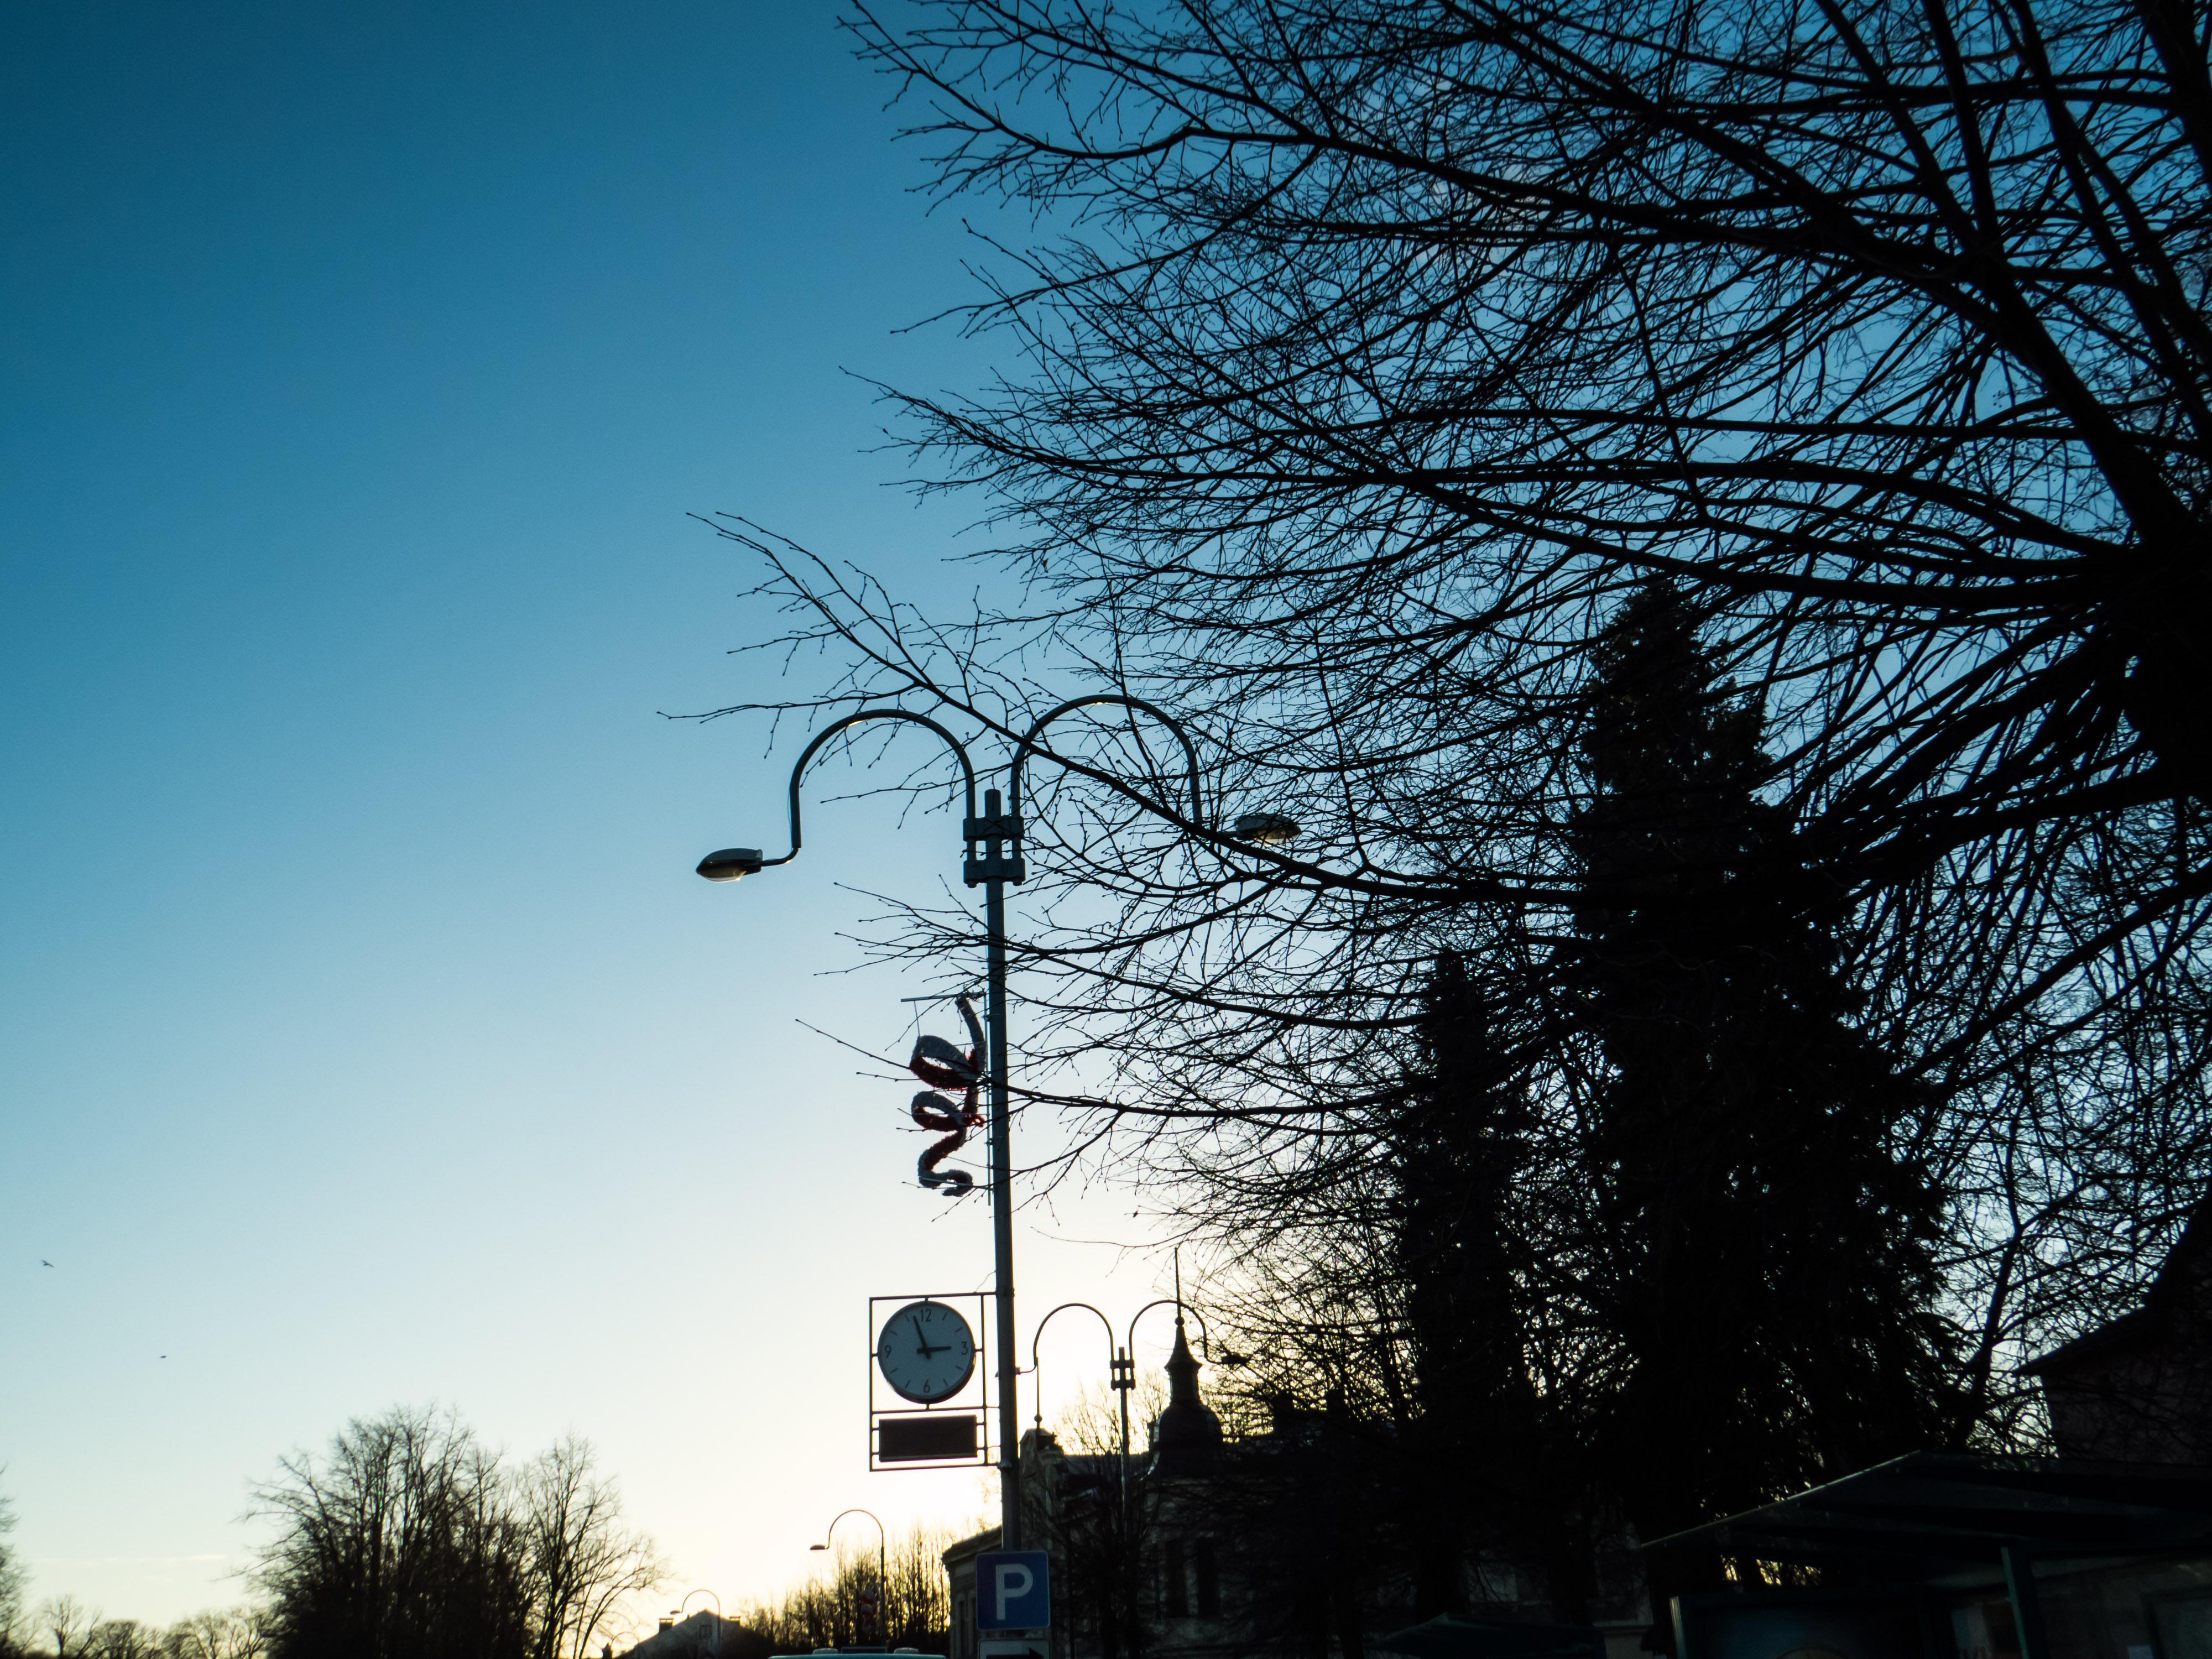 Winter evening photo